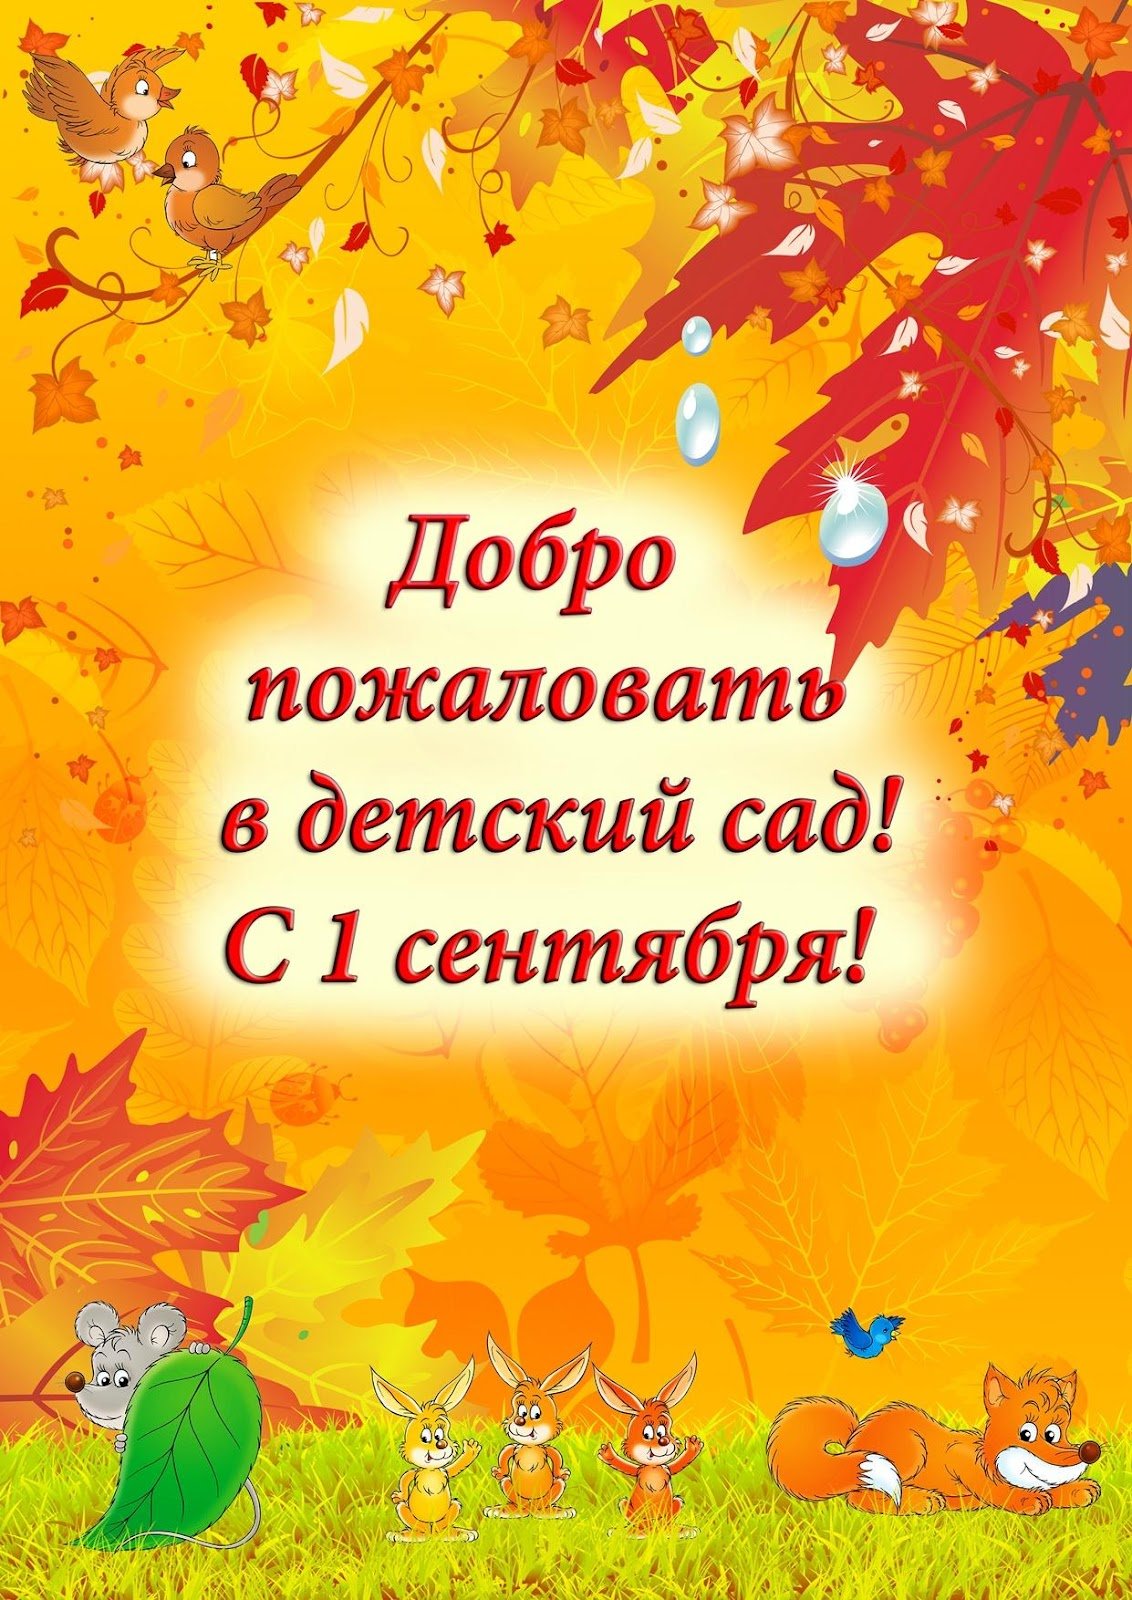 http://detsad6.clan.su/novosti/leto2013/plakat_1.jpg